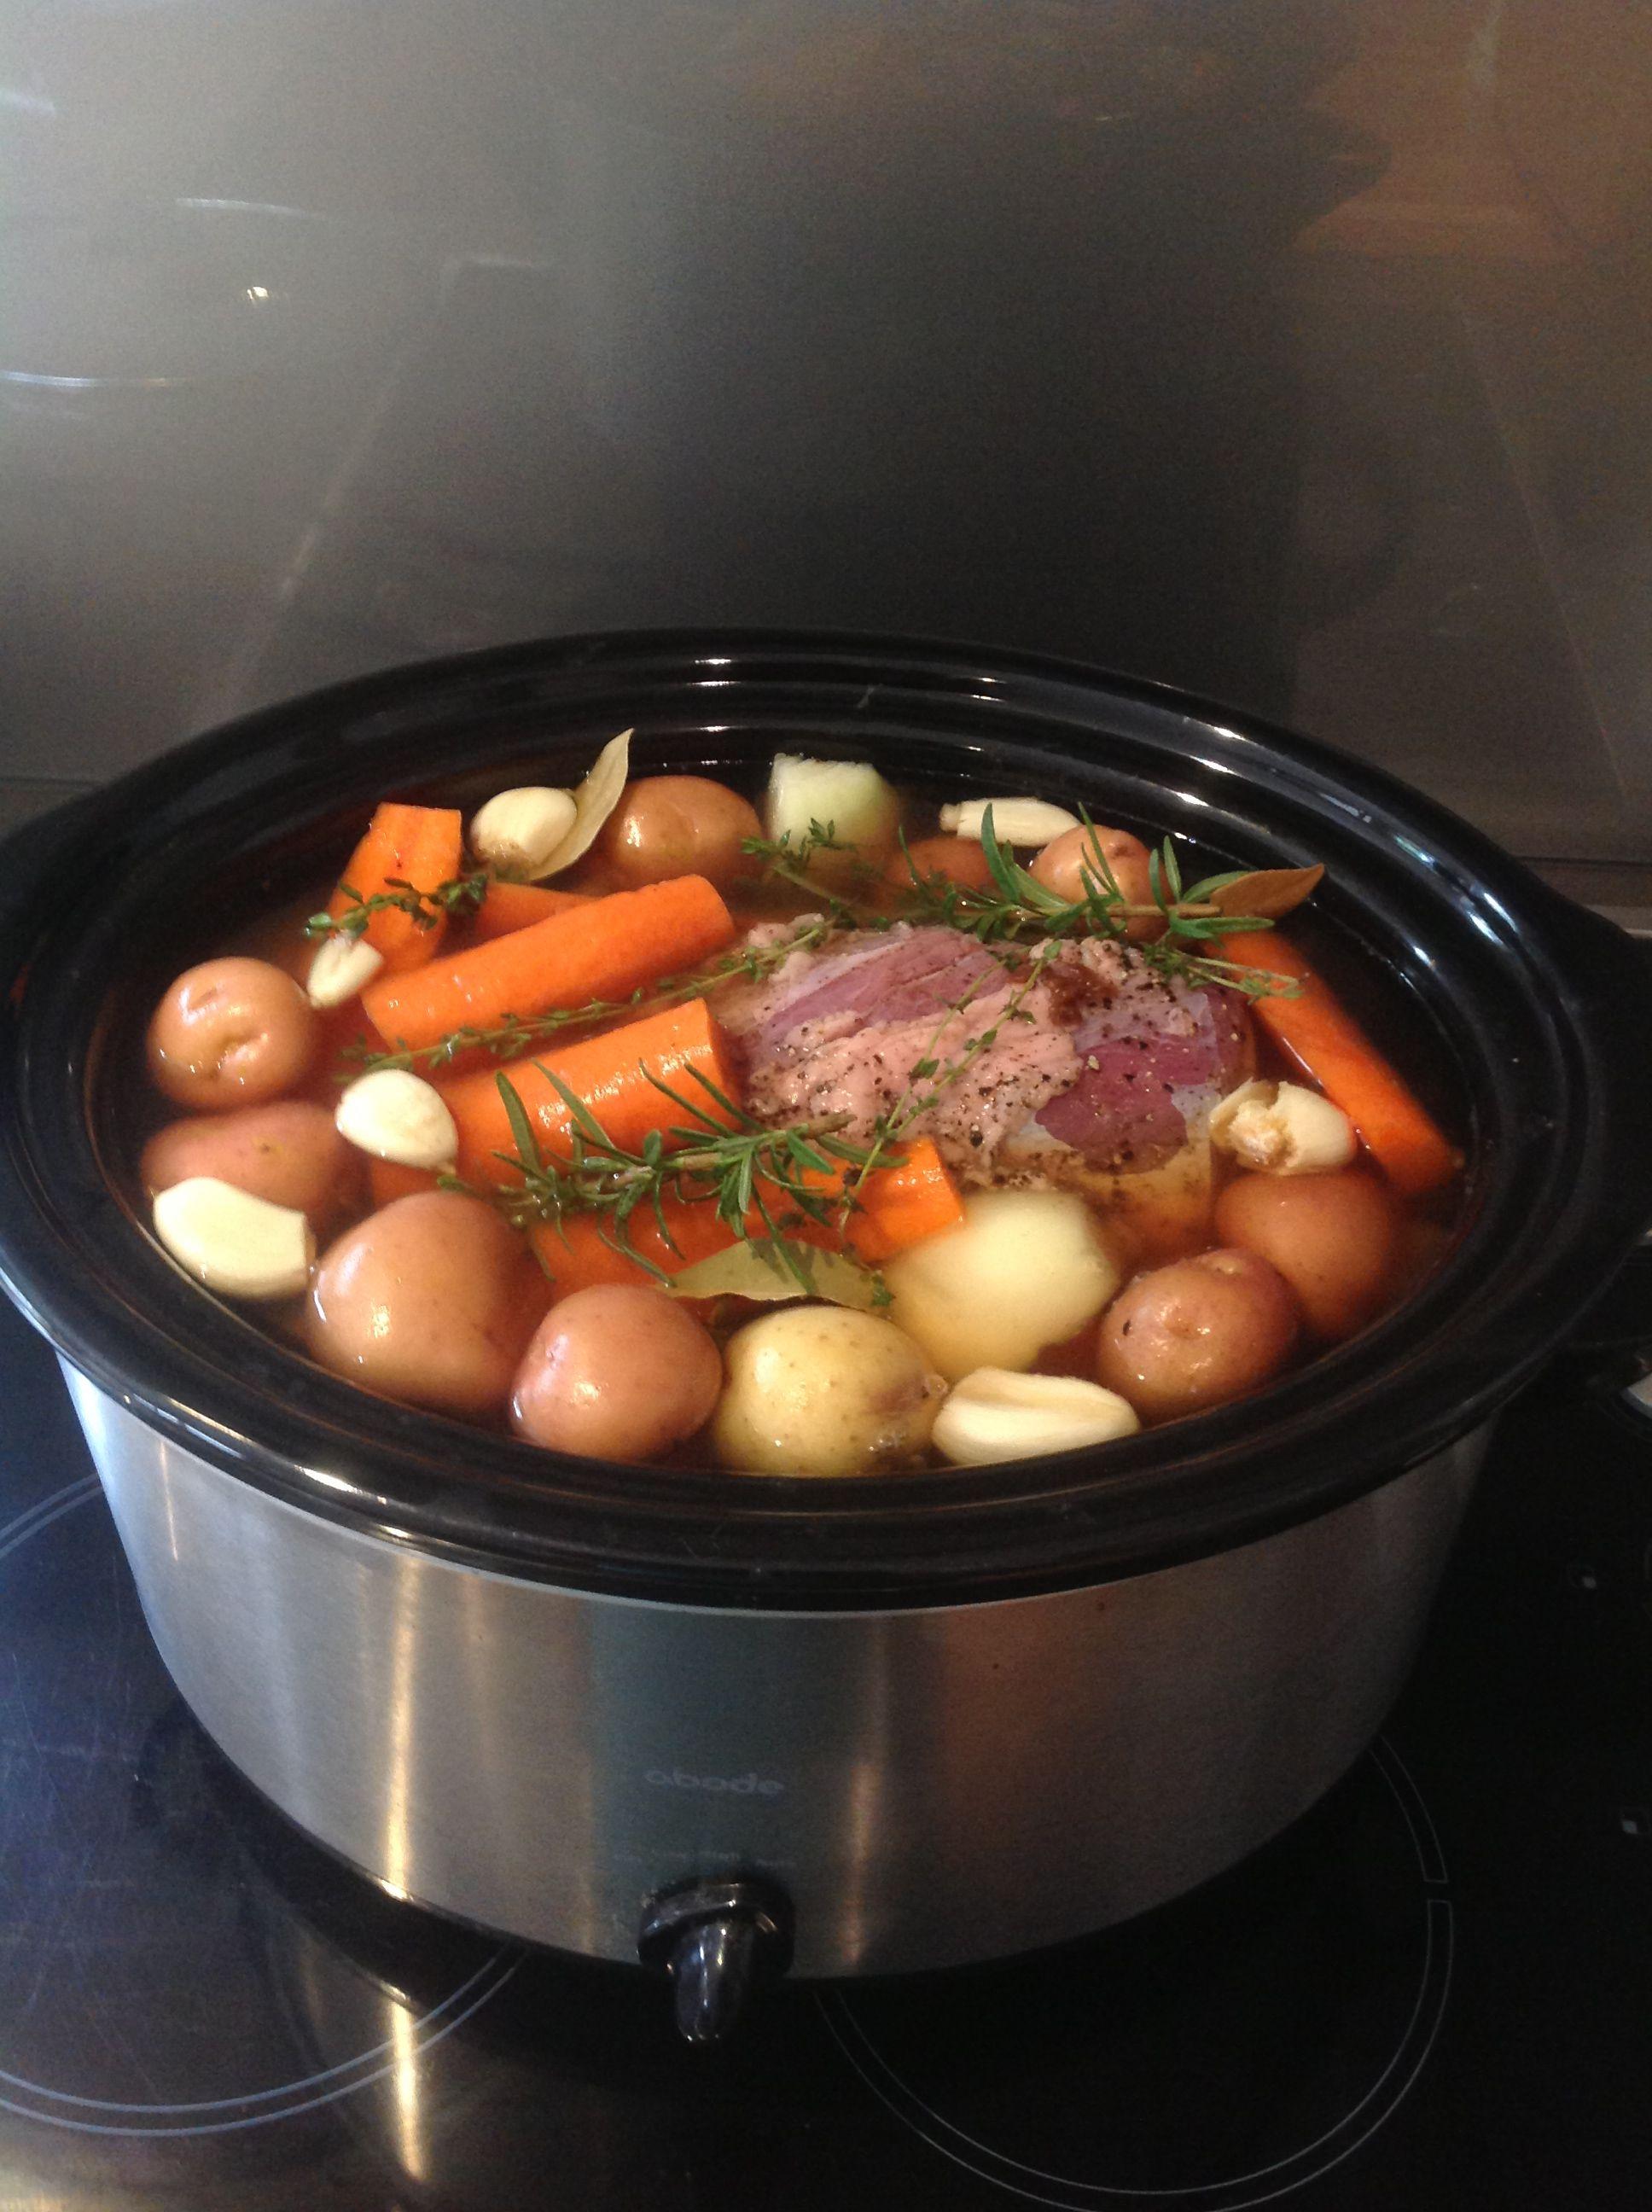 Tonight S Dinner Slow Cooker Corned Beef Silverside All Ingredients In Beef 6 Onio